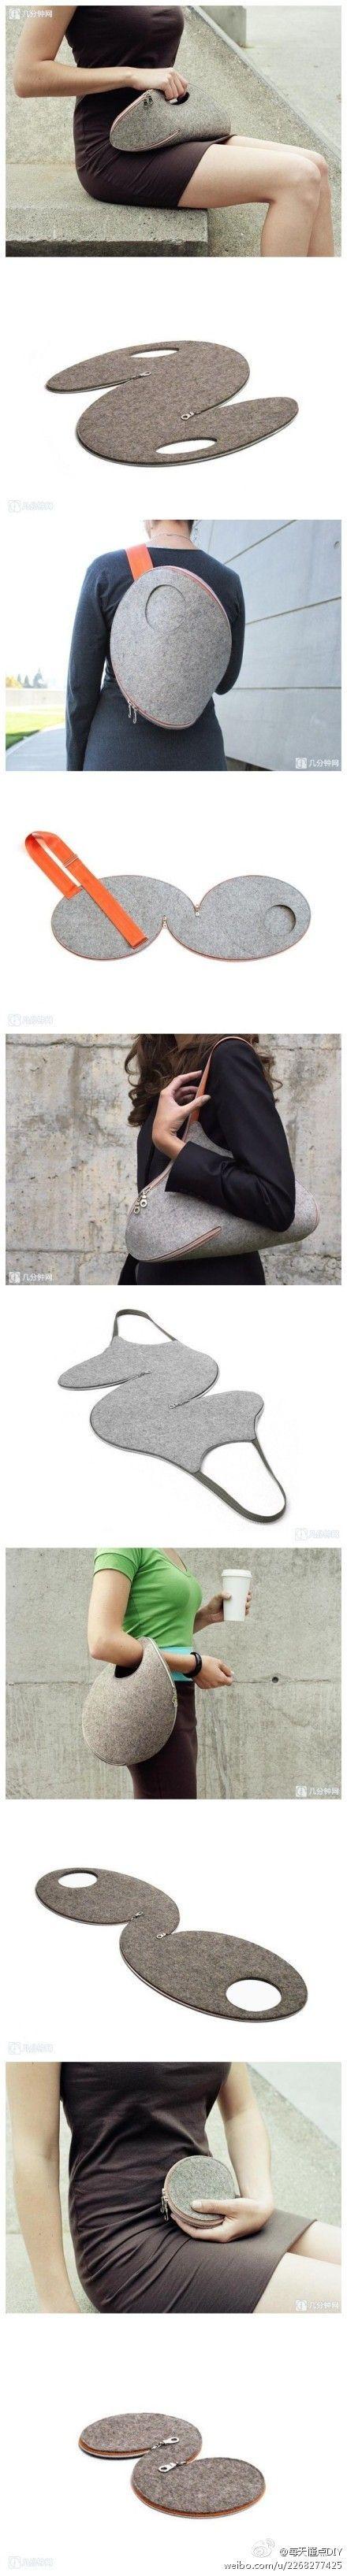 Just fabulous! Clever bag design